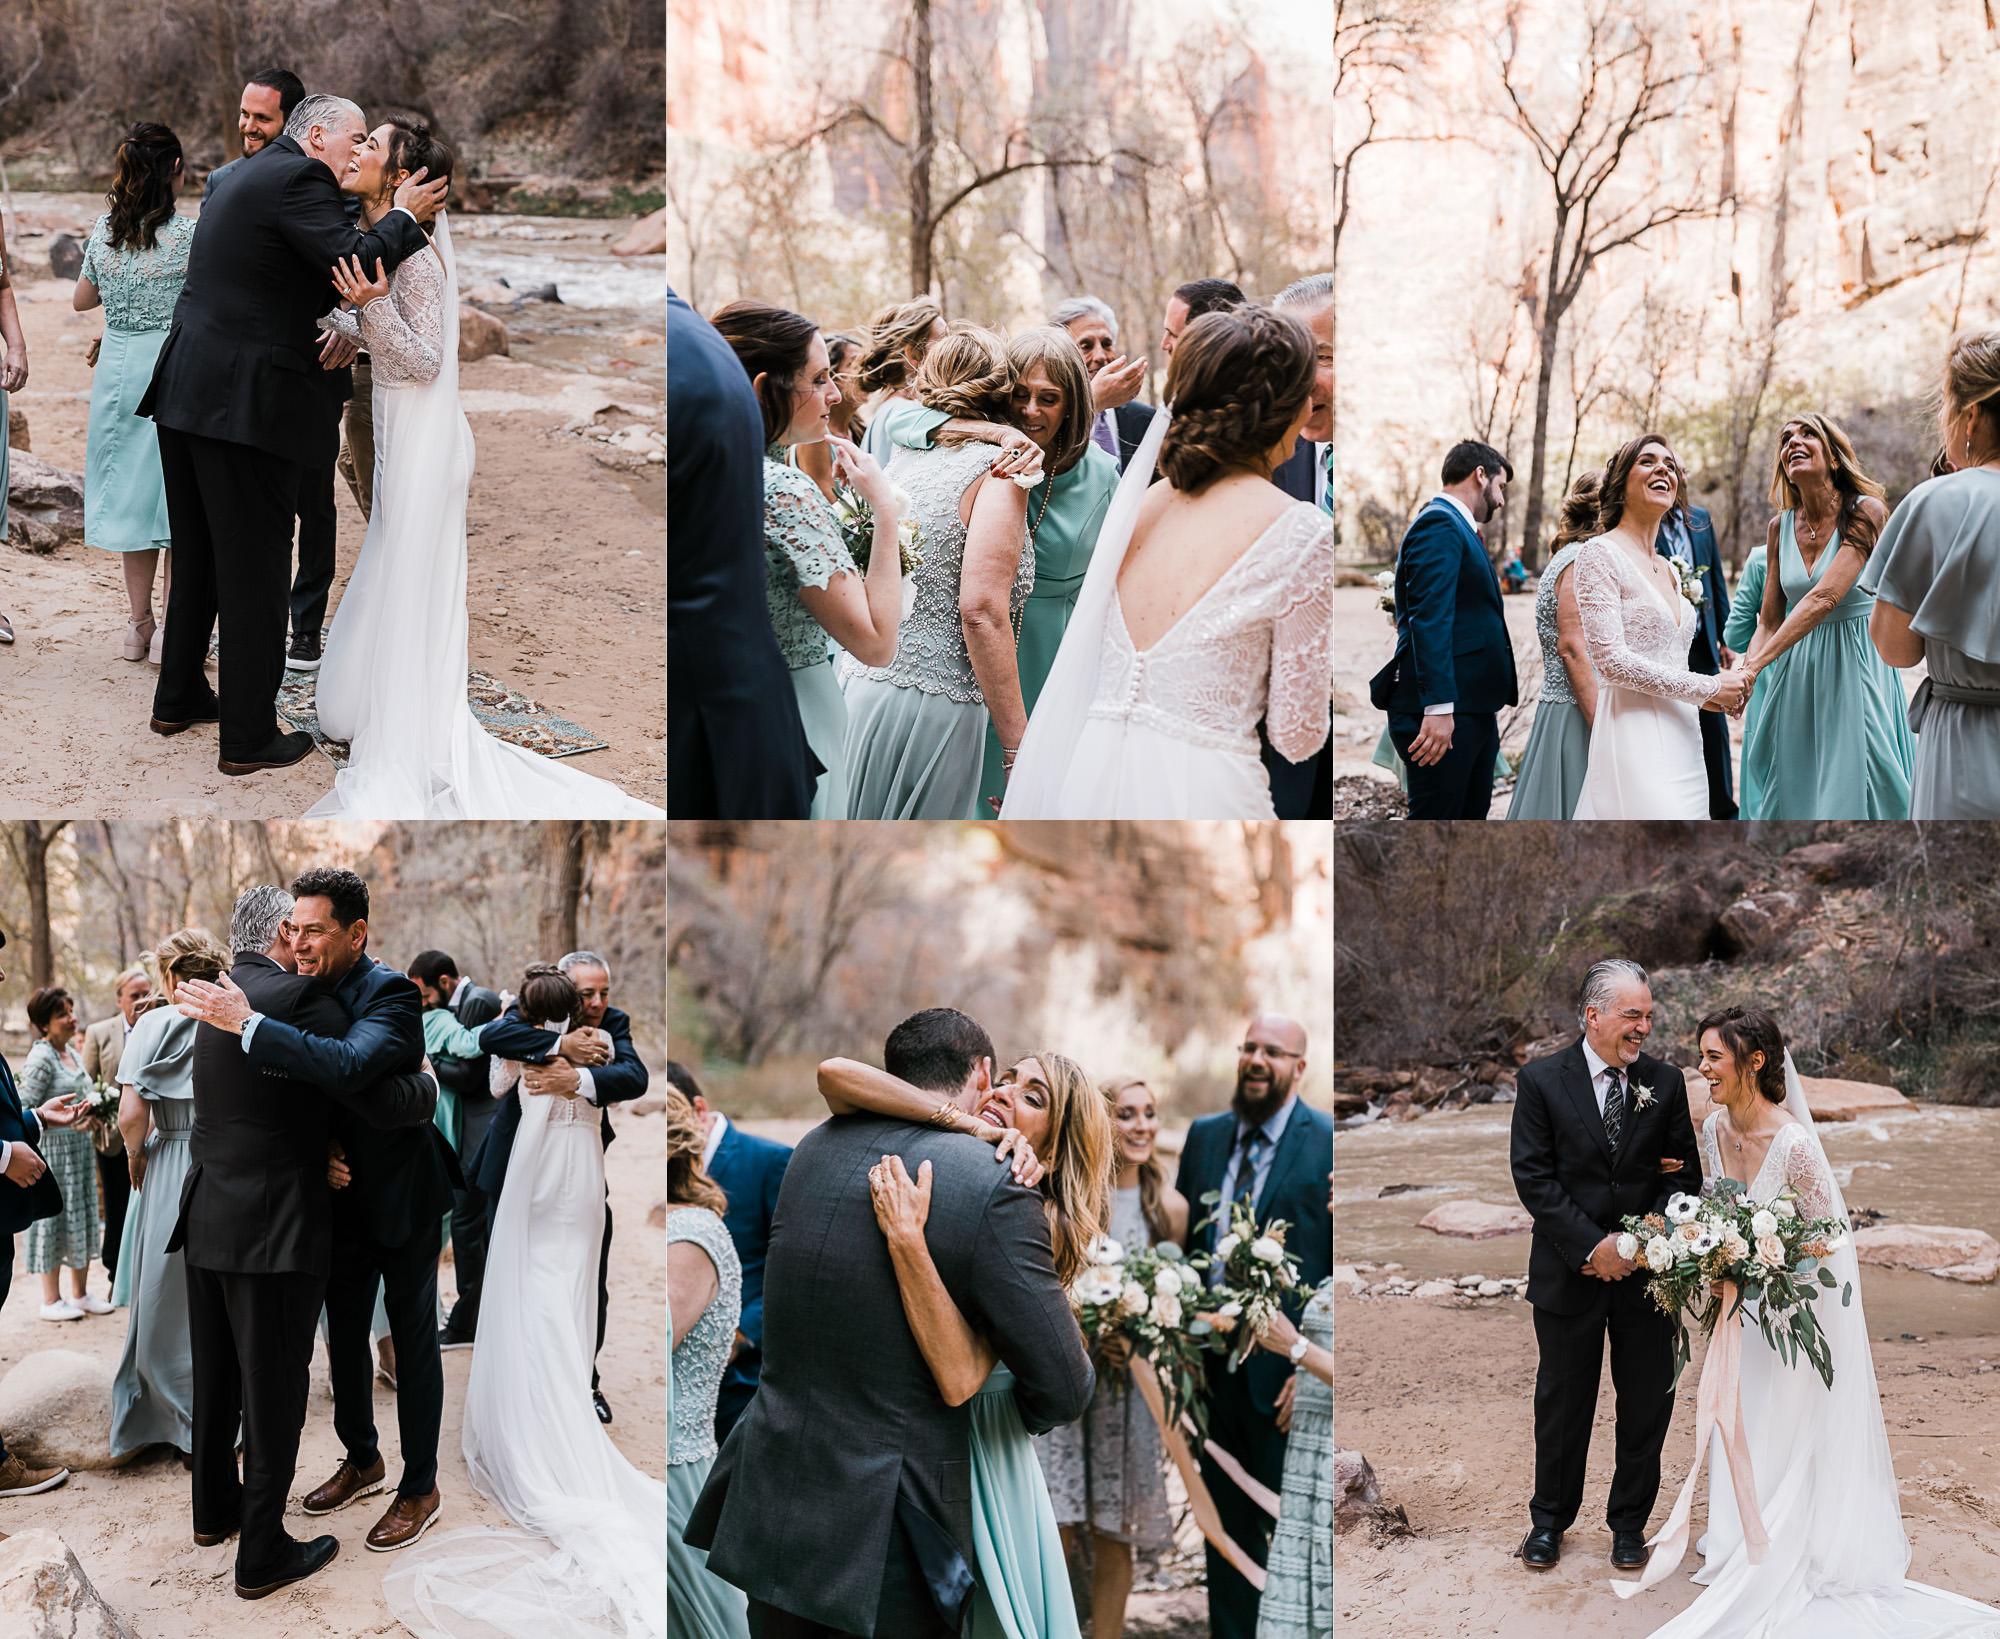 Zion-National-Park-Adventure-Wedding-Hearnes-Elopement-Photography-14.jpg